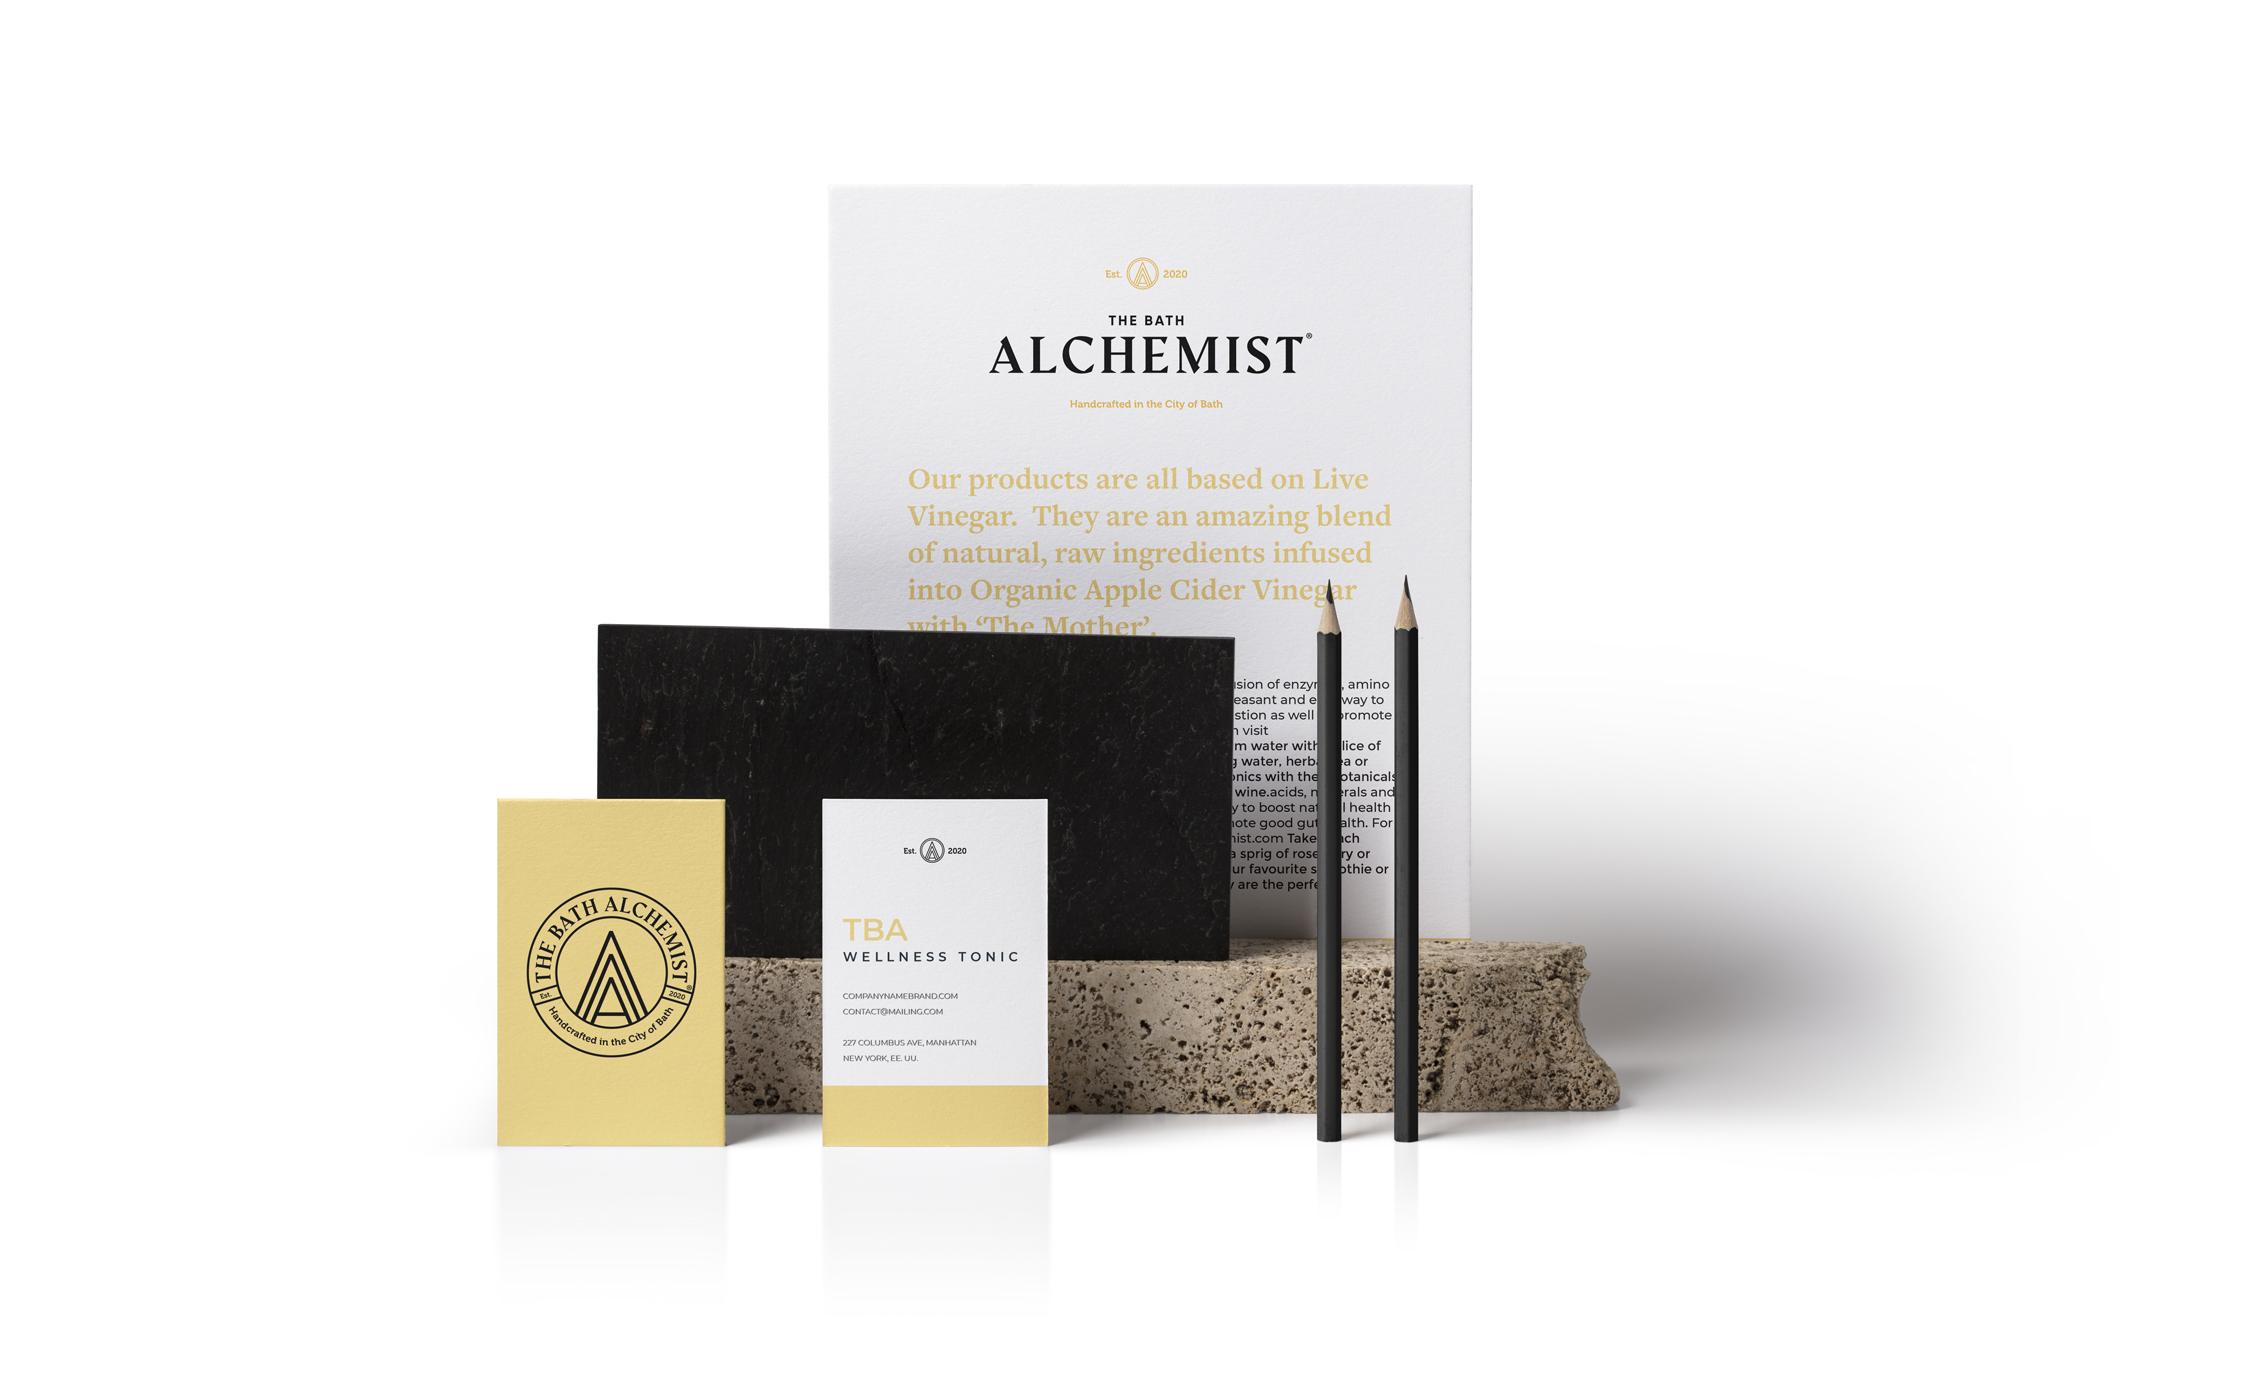 the bathalchemist-brand